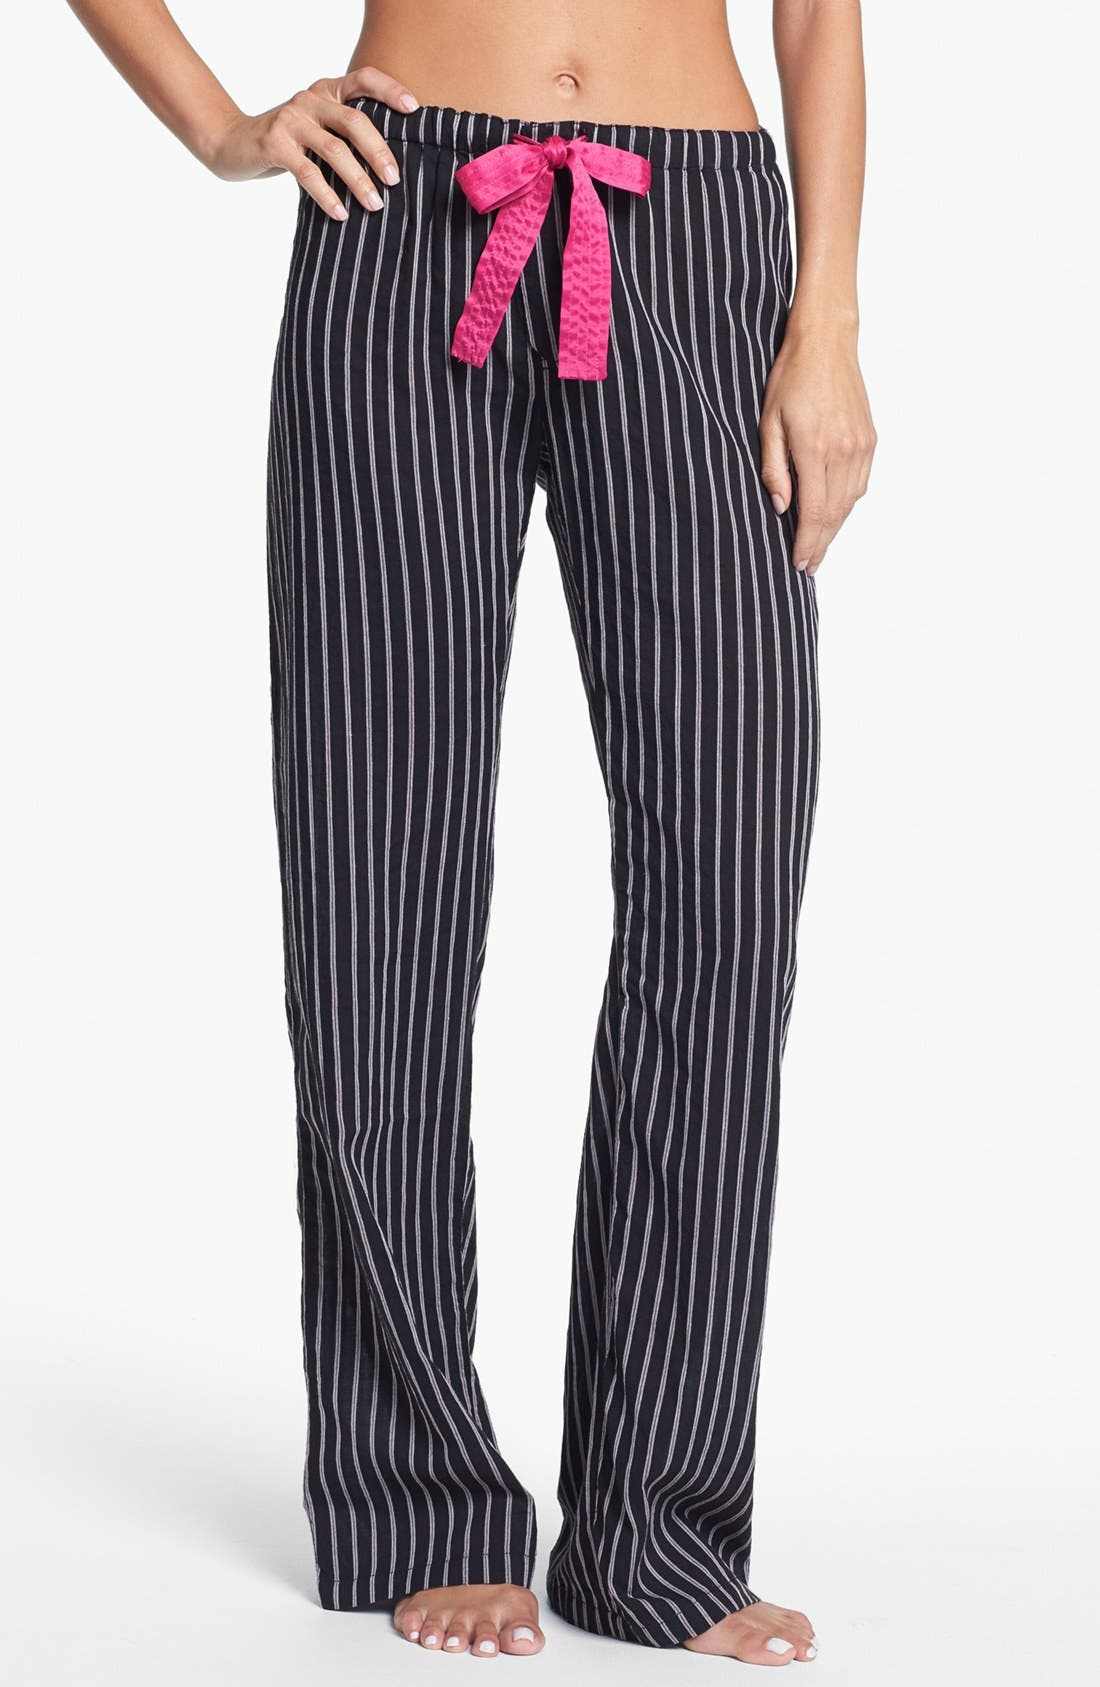 Main Image - PJ Salvage 'Pop of Pink' Lounge Pants